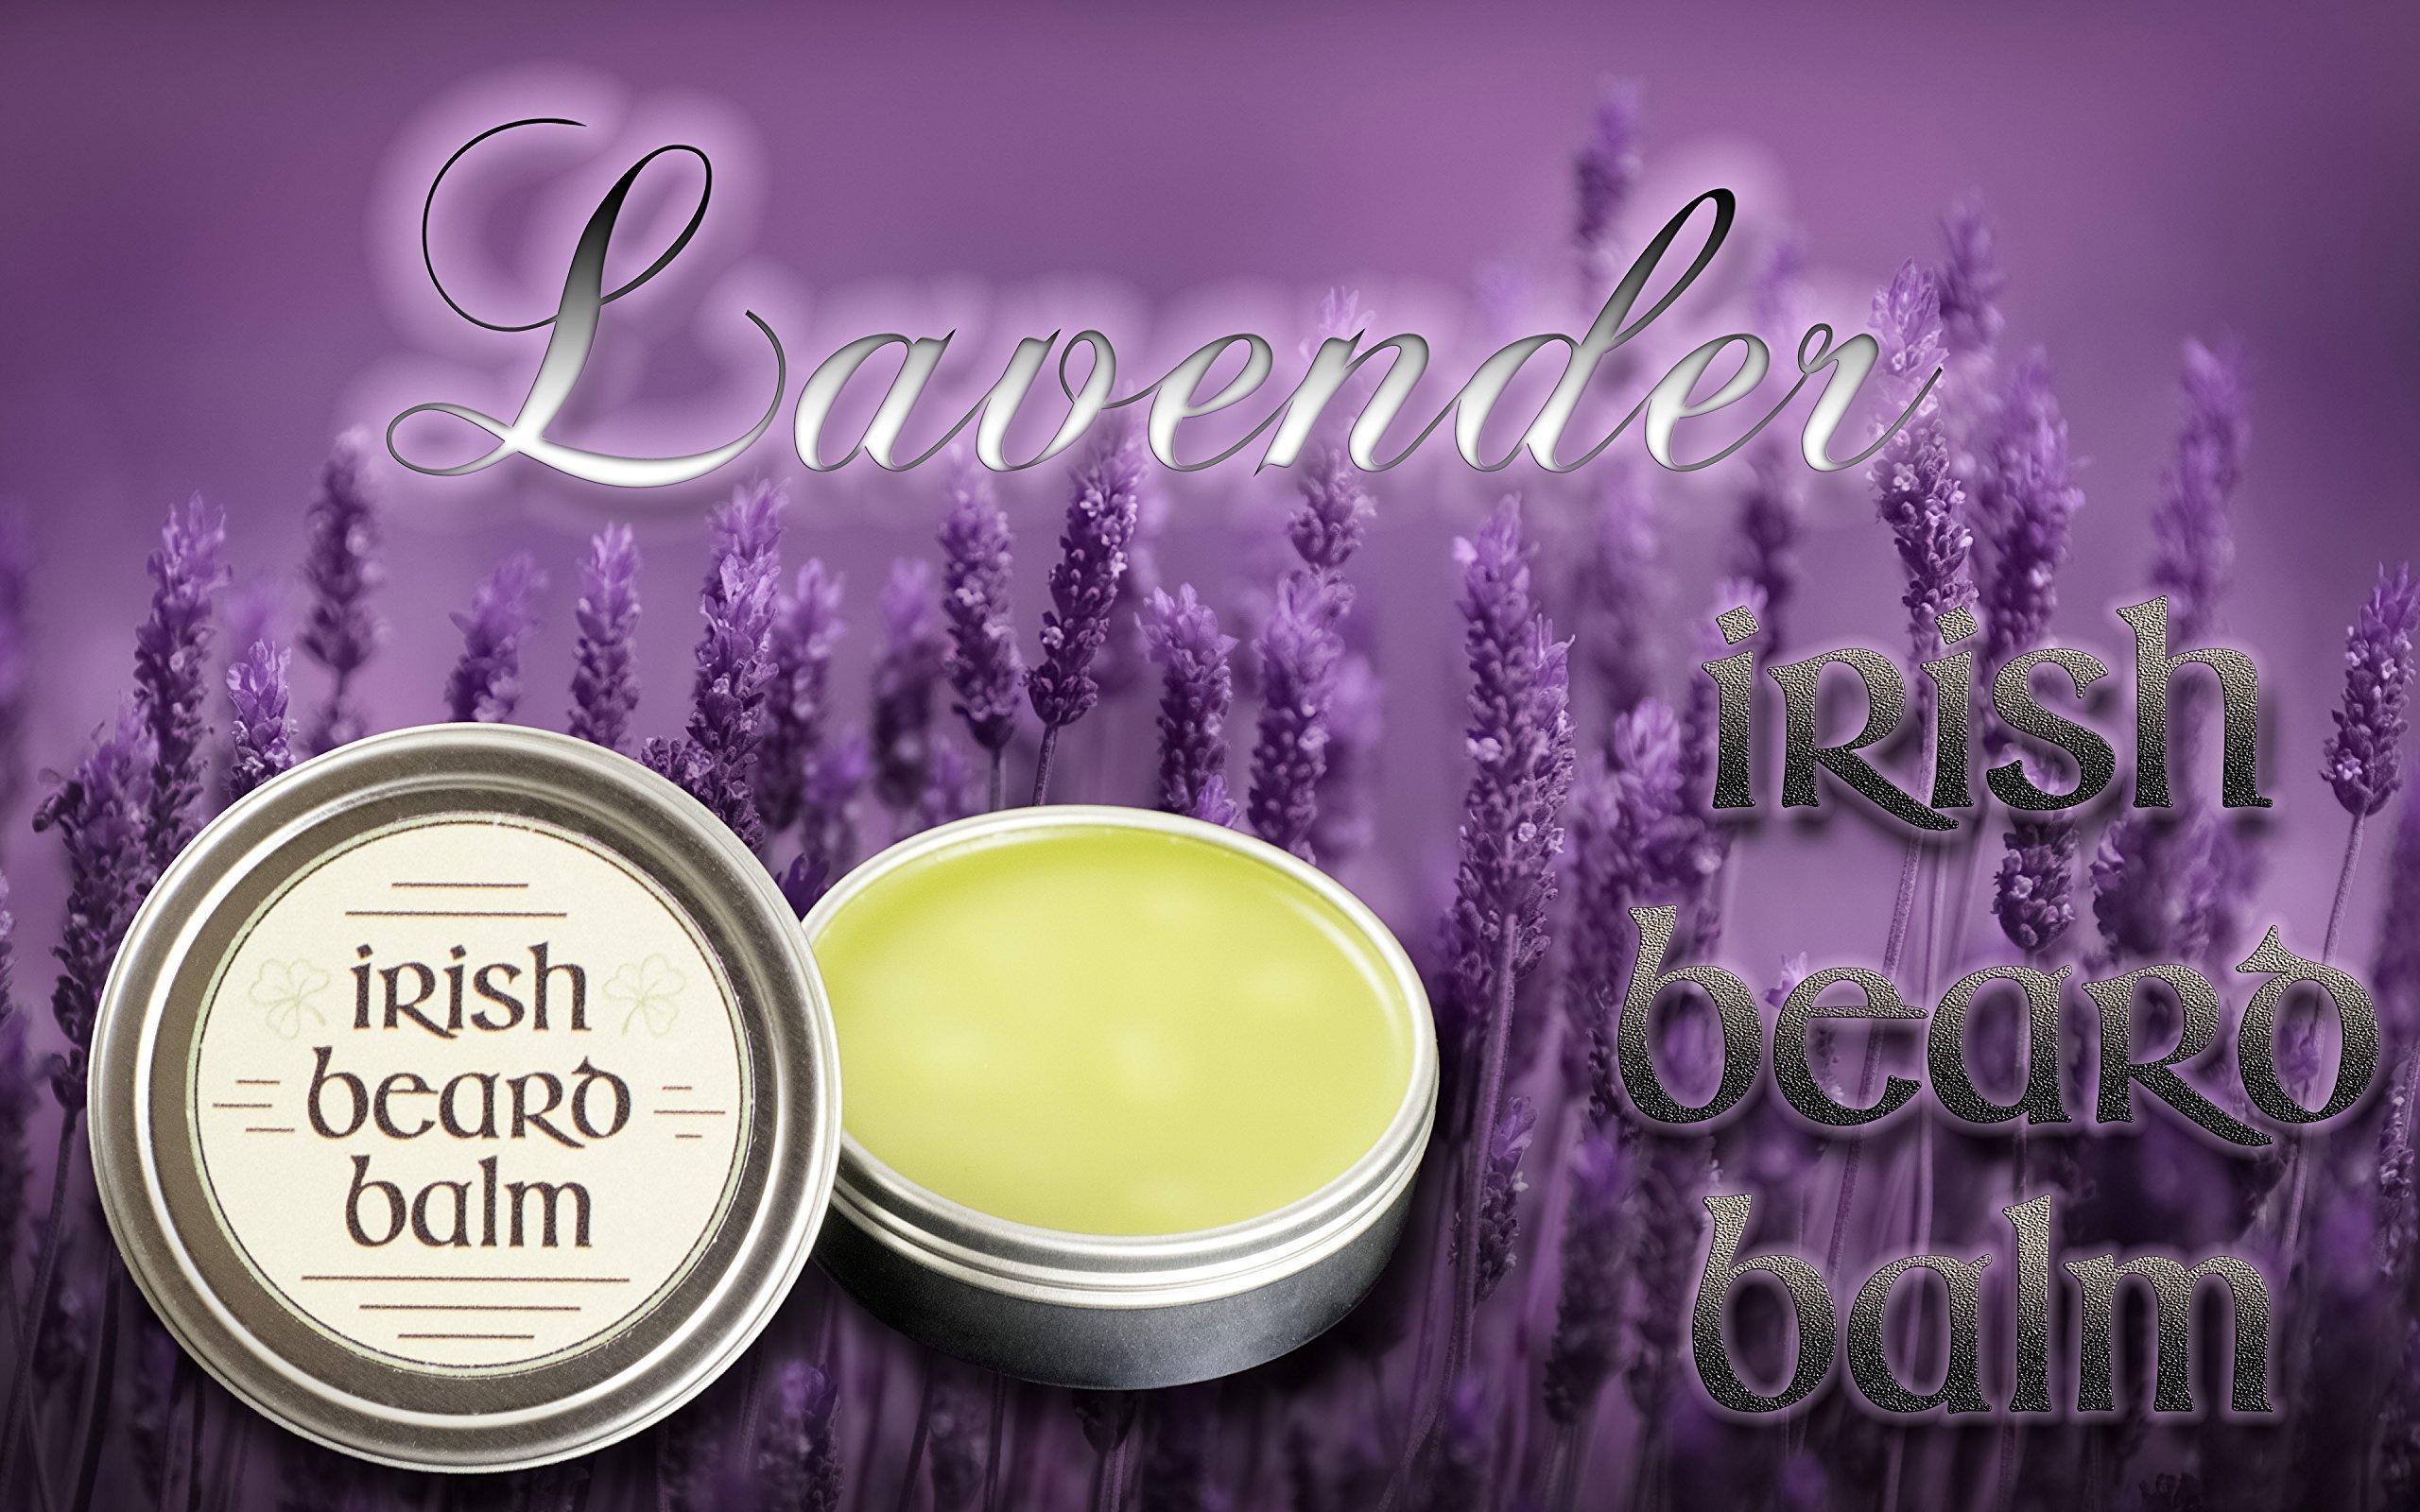 Irish beard balm Lavender by Irish beard balm